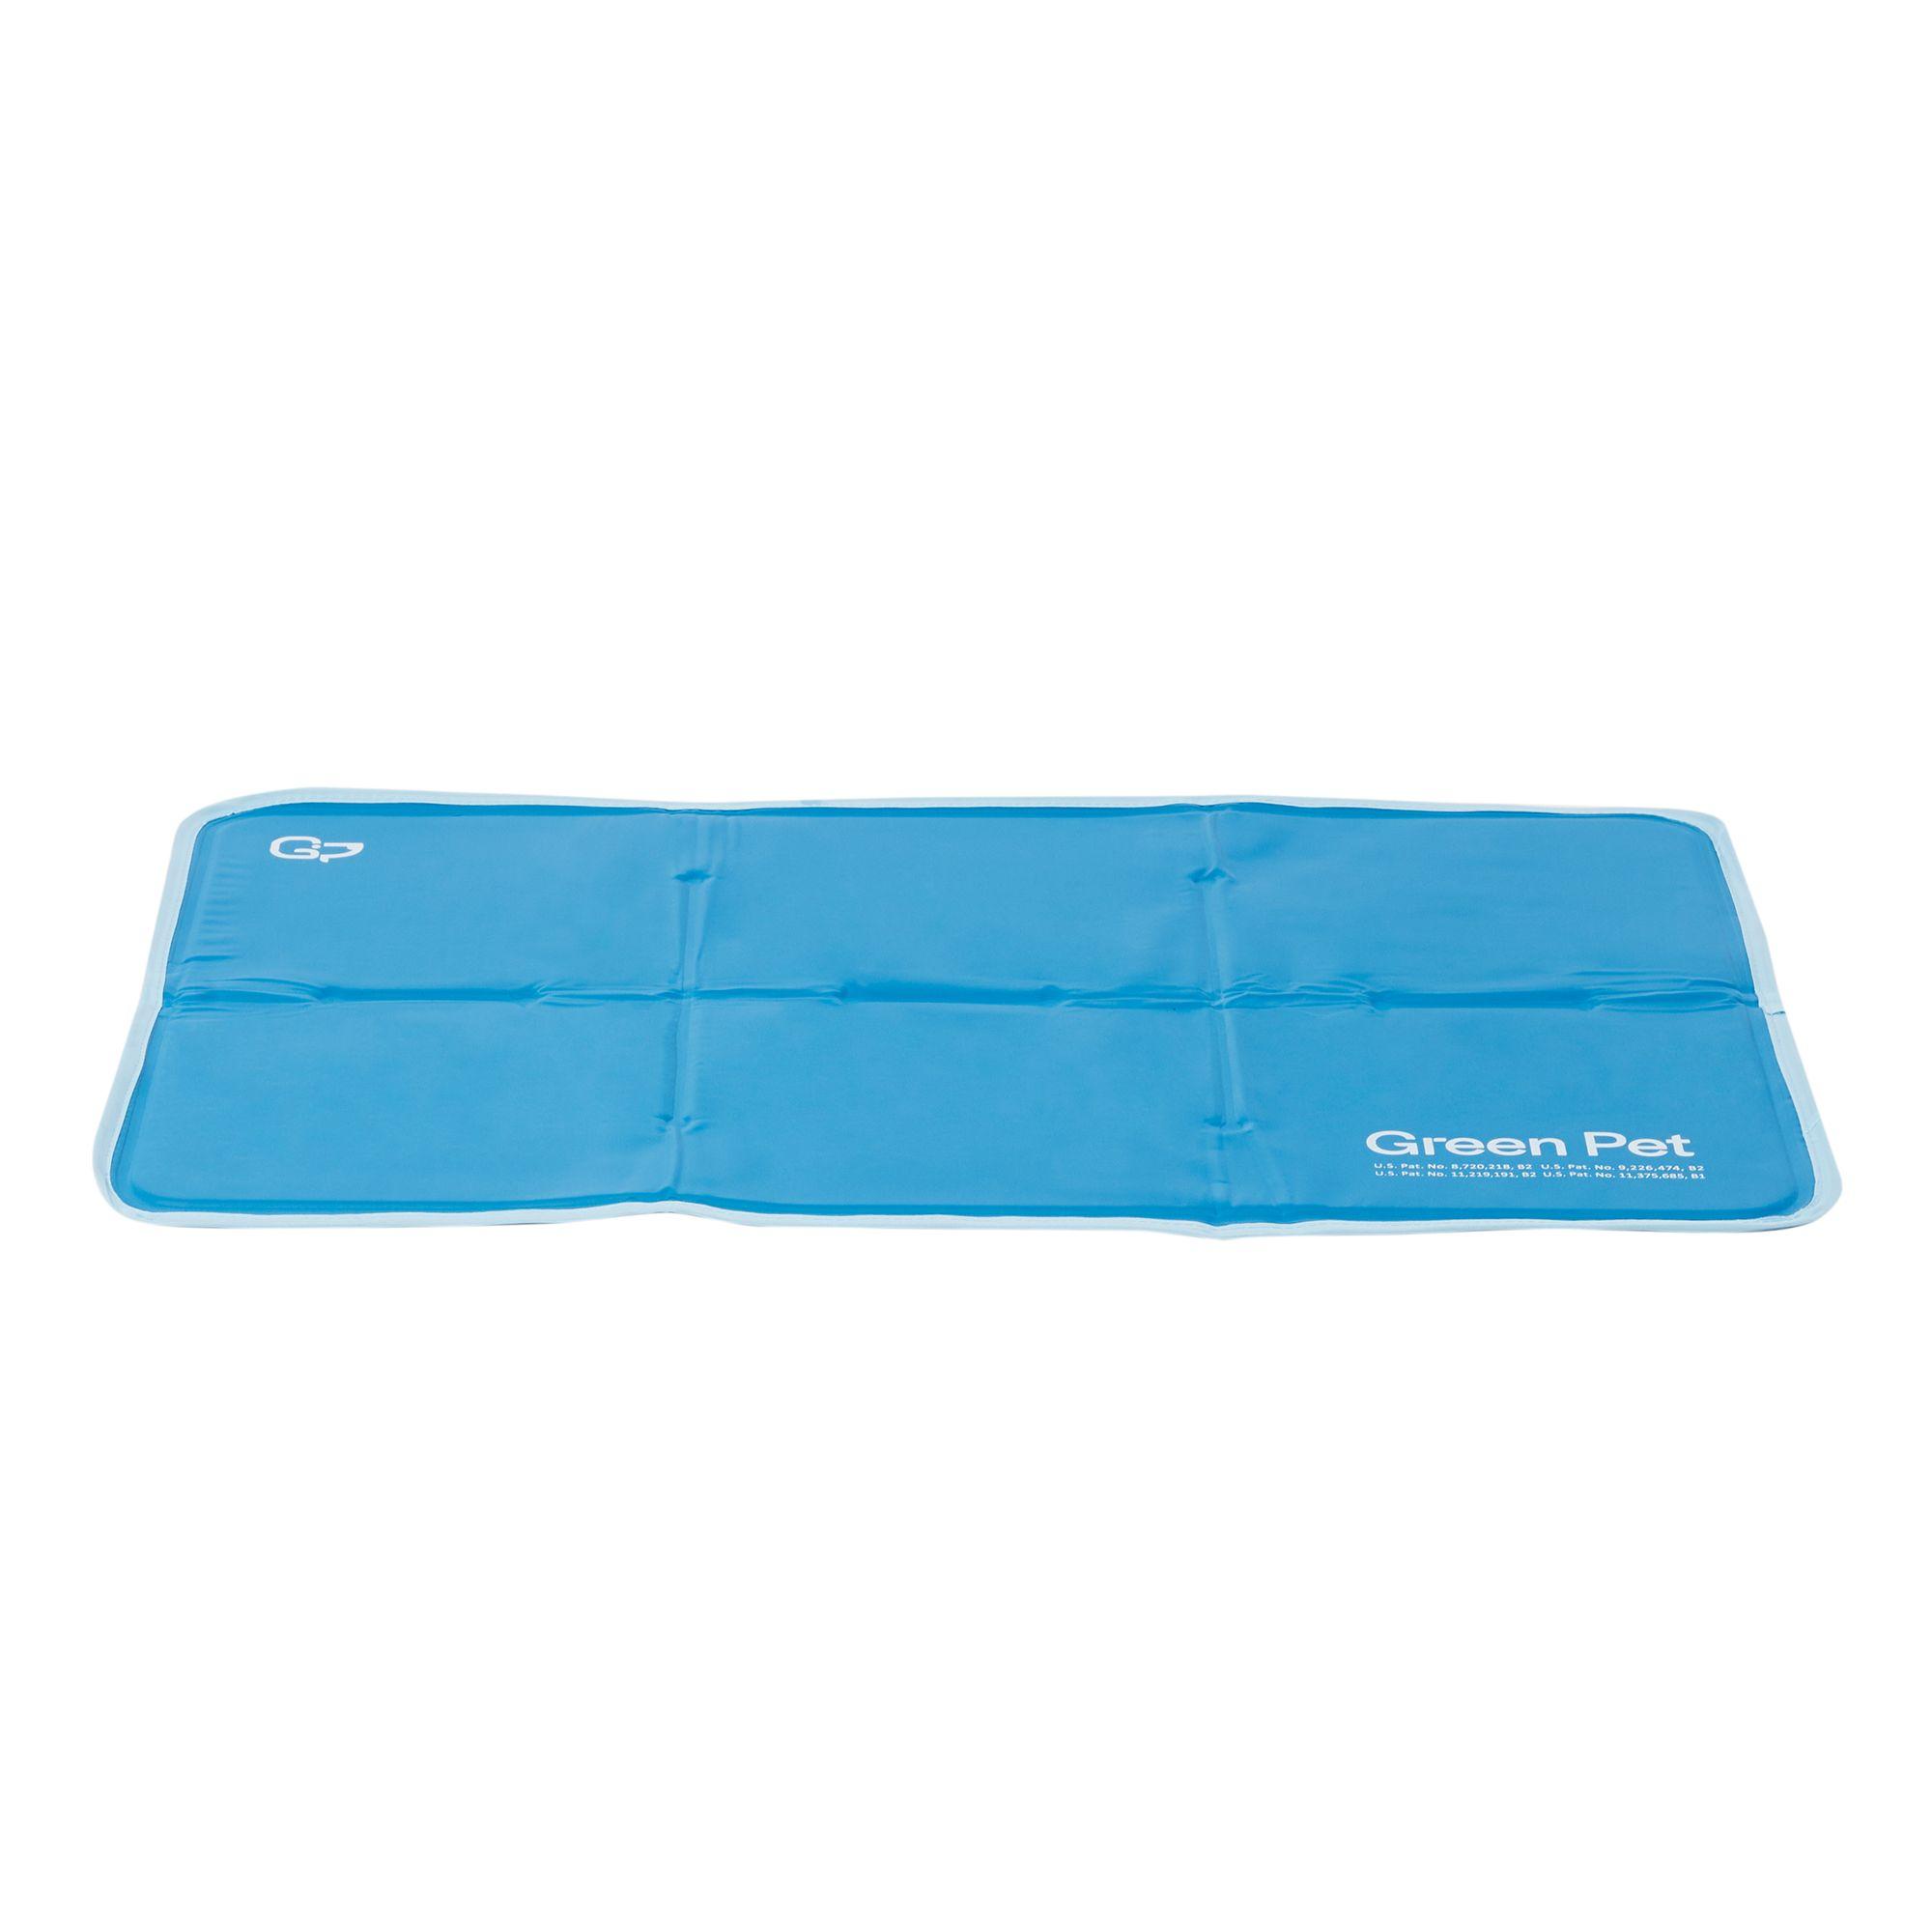 Thegreenpetshop Cool Pet Pad Size 23l X 35w Blue